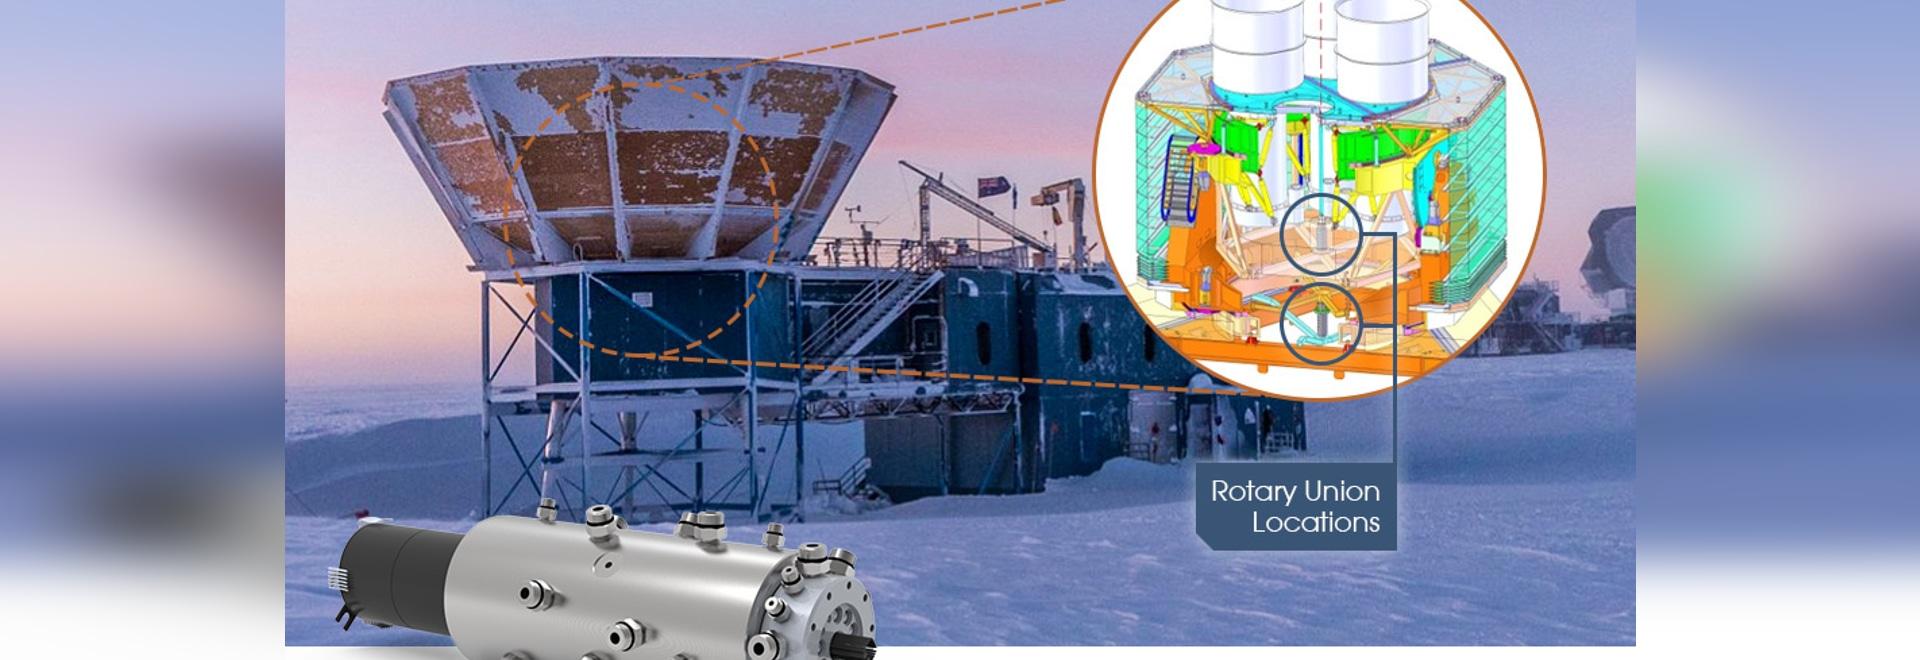 DSTI's custom rotary union & electrical slip ring assembly